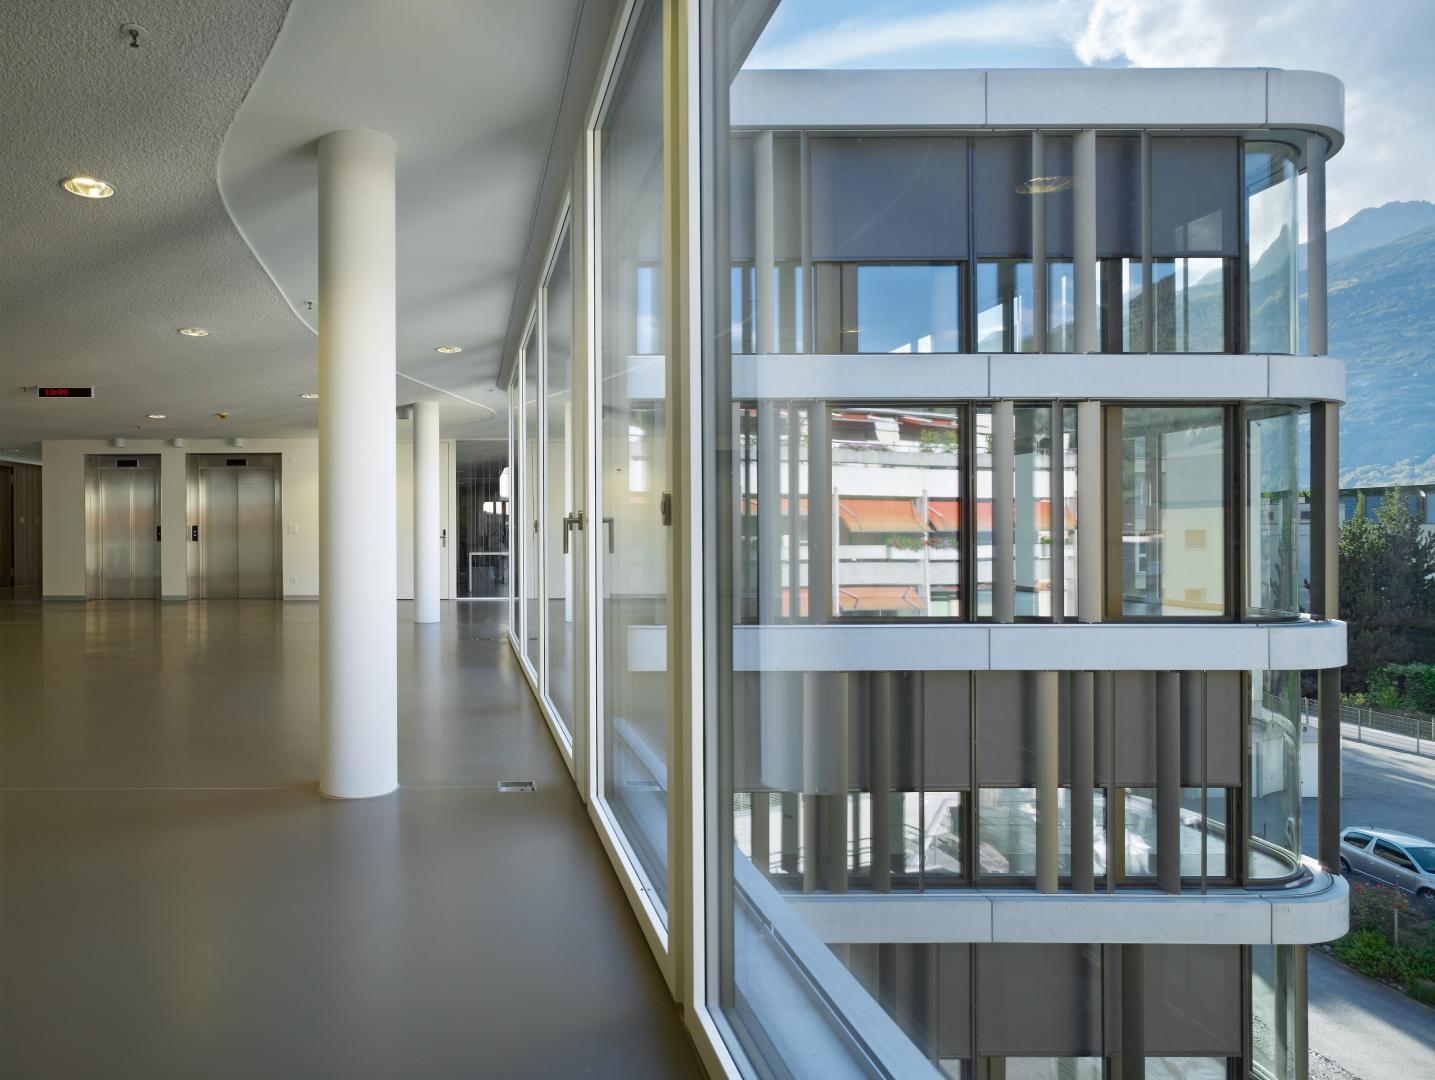 Aufenthaltszone Wohngeschoss © Ruedi Walti, Basel